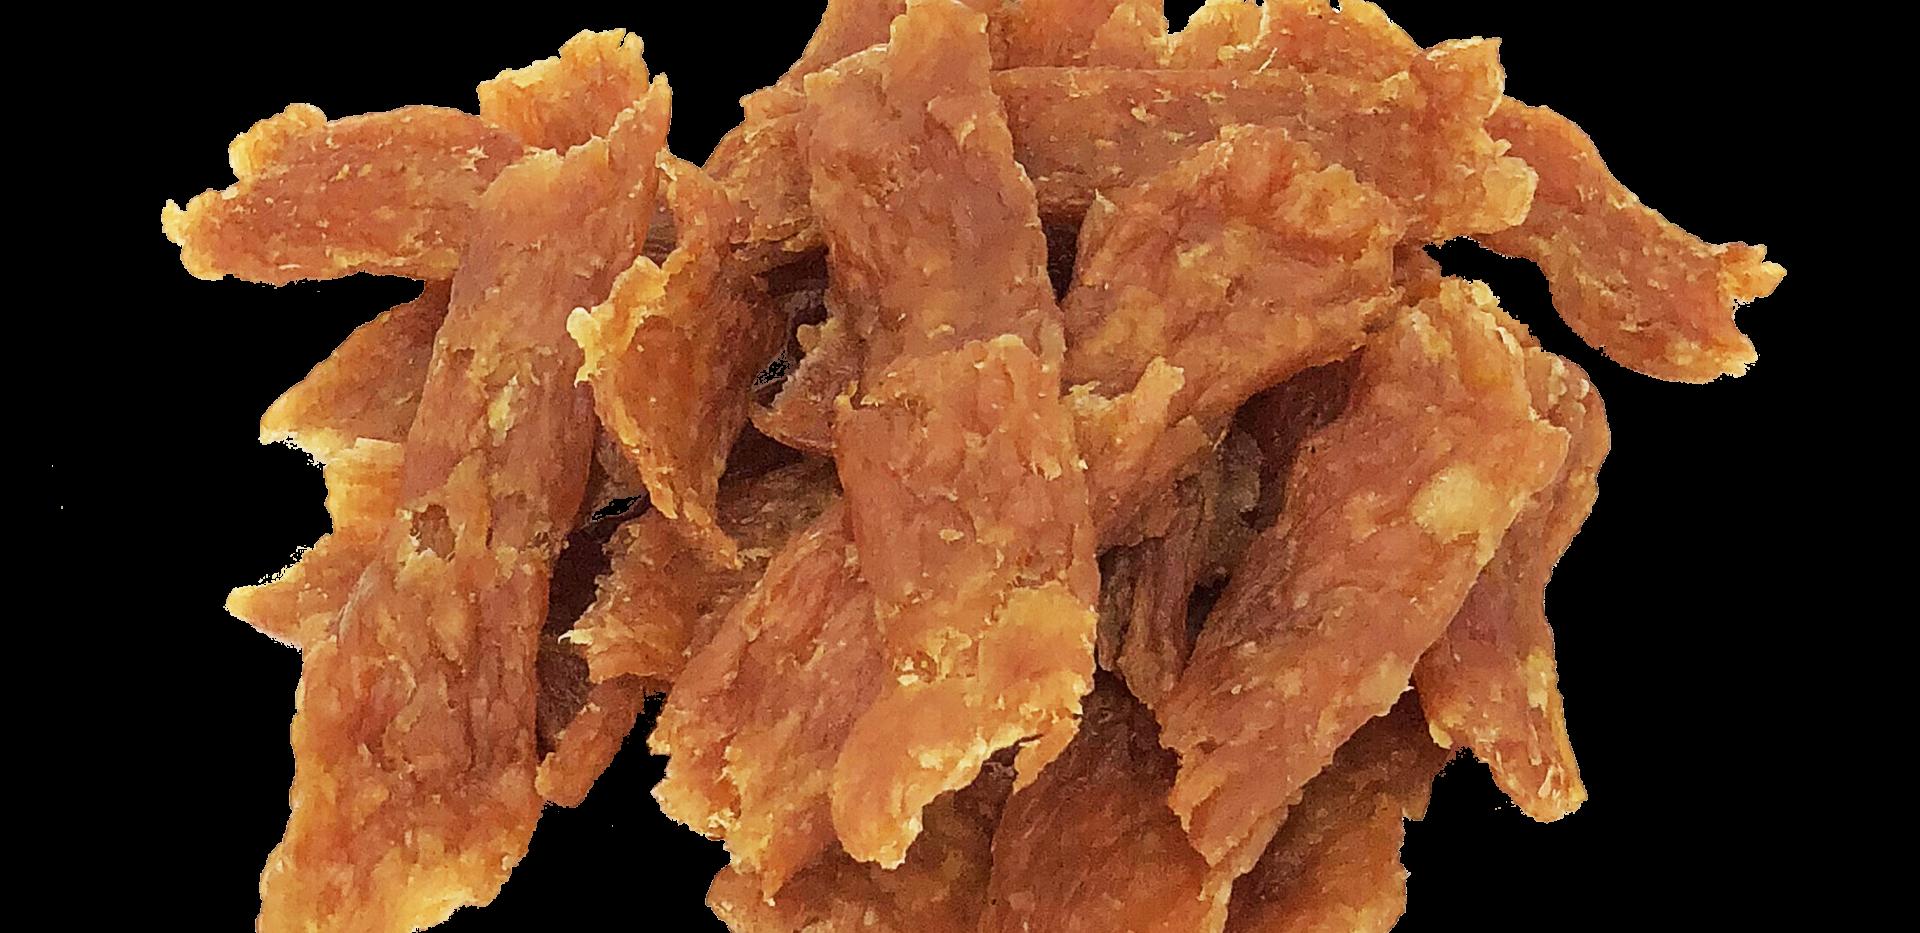 Chicken Jerky - Treats